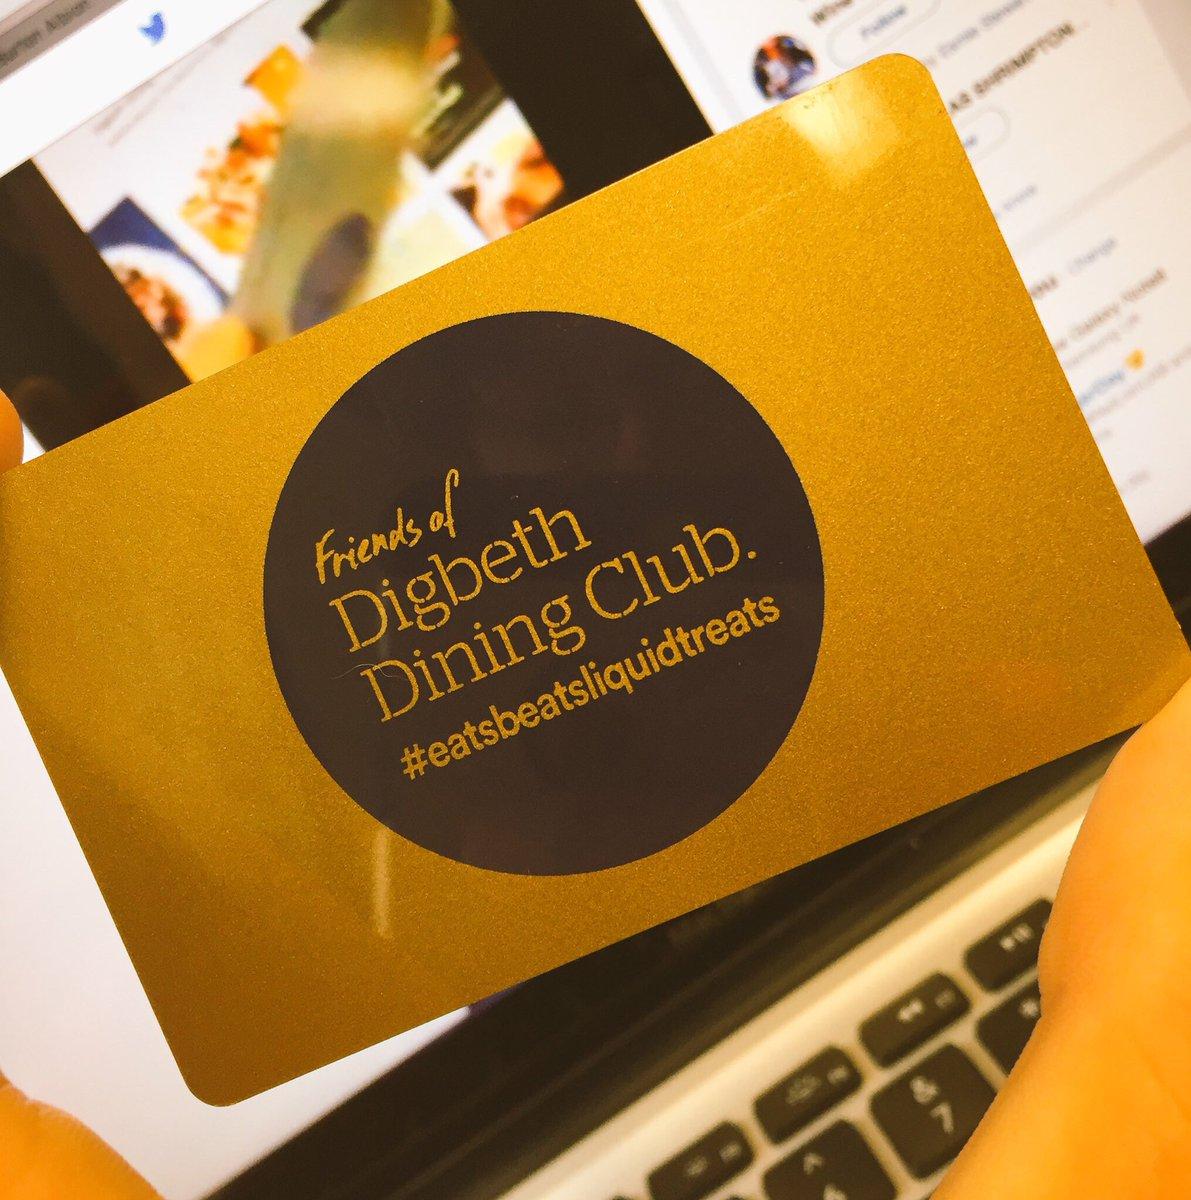 Card dining club Dining Club